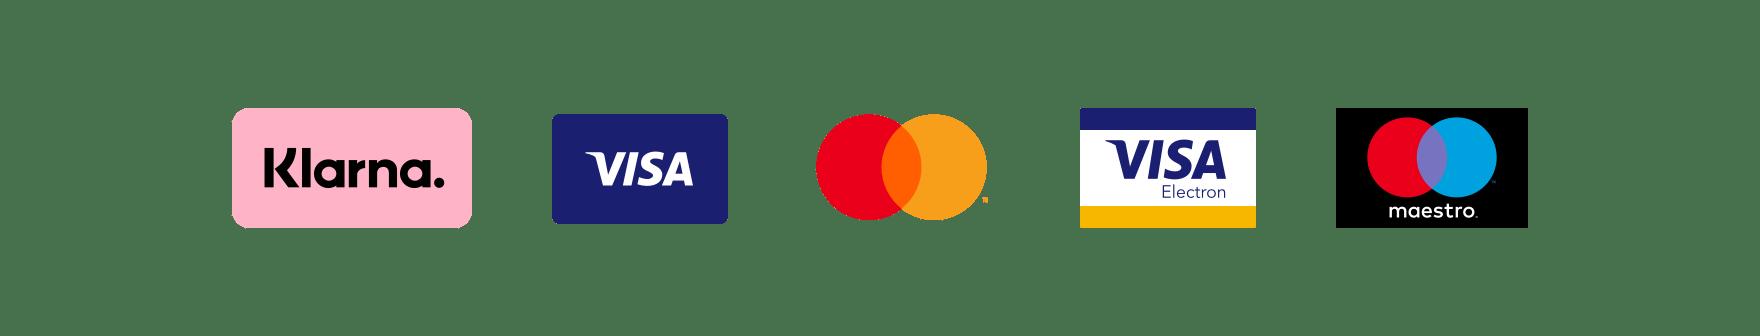 payment metod klarna